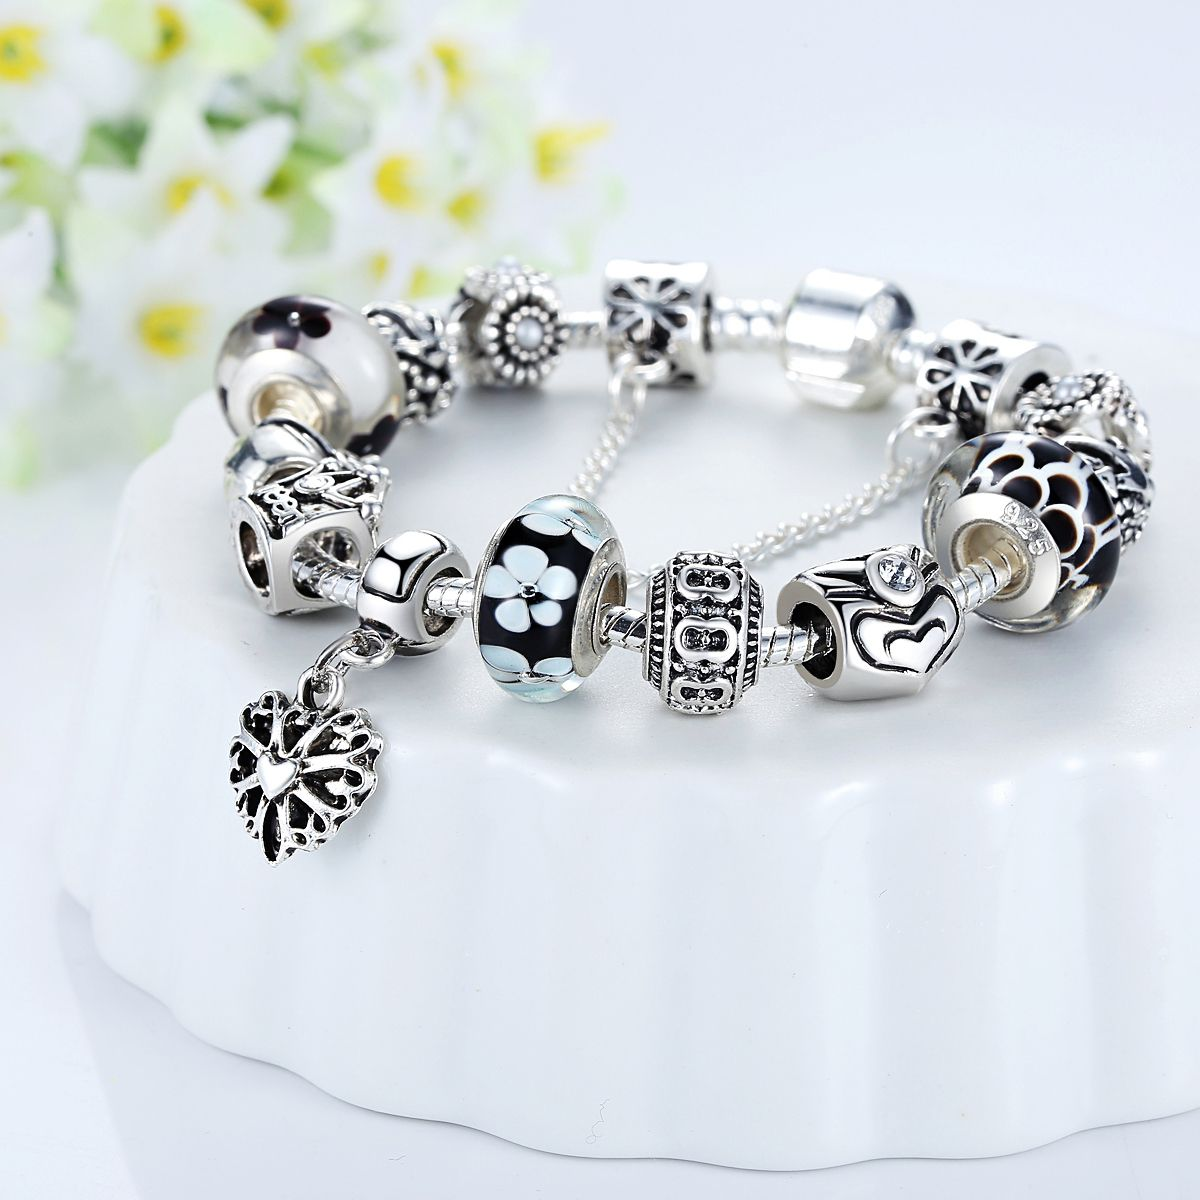 Crystal rhinestone bracelet women jewelry and watch pinterest